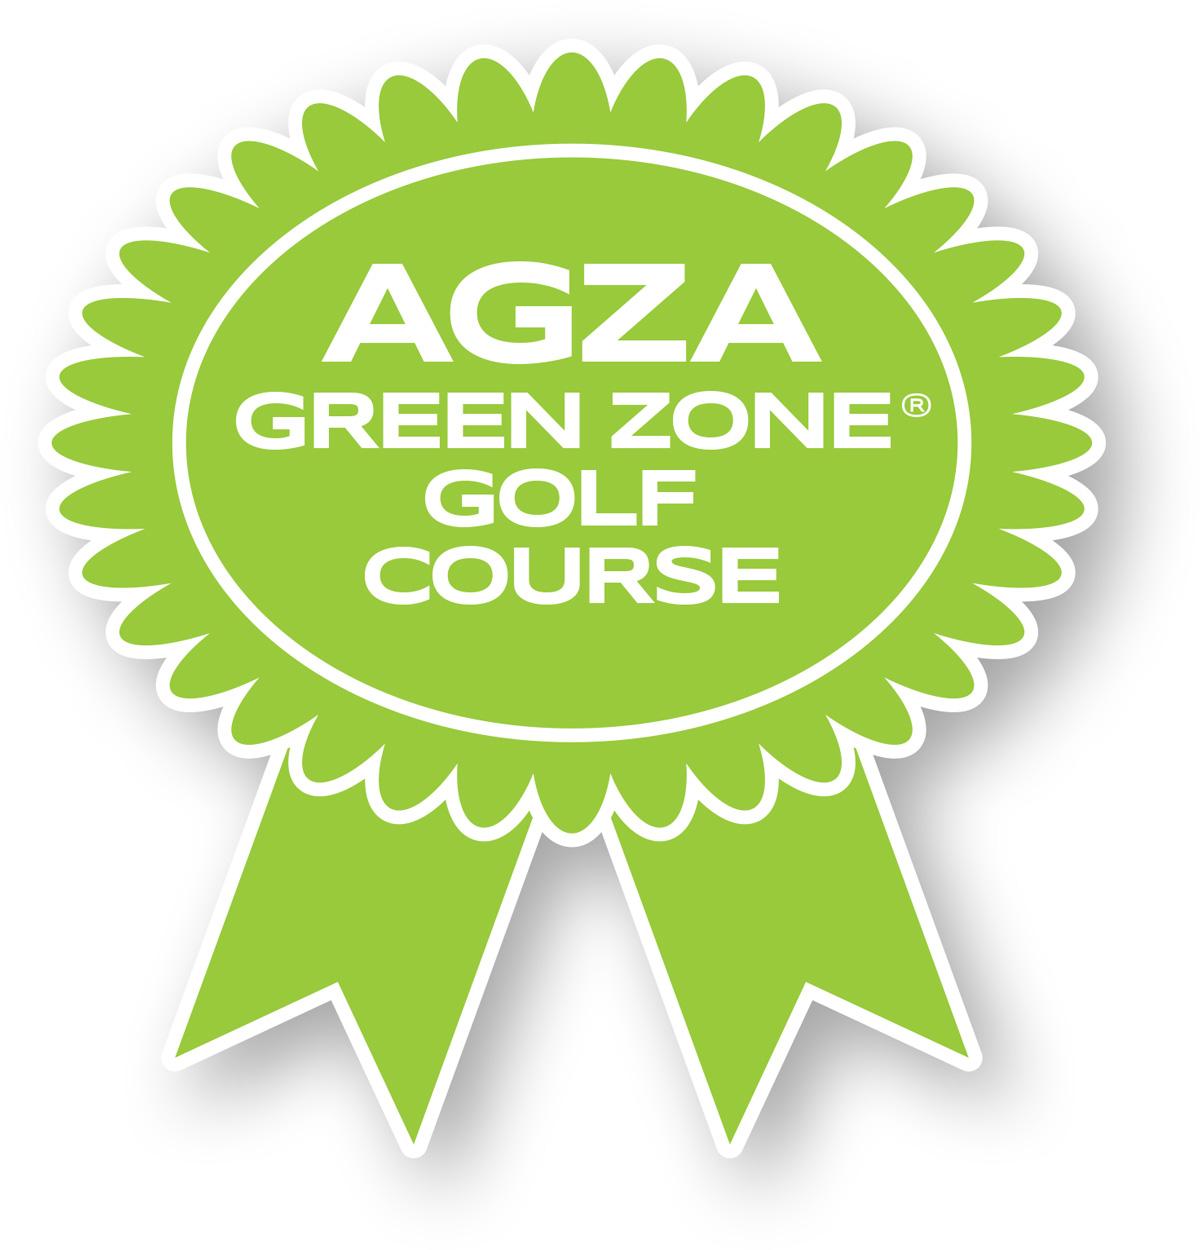 AGZA_GFX_Ribbon_Green_Zone_Golf_Course_SHADOW_640.jpg